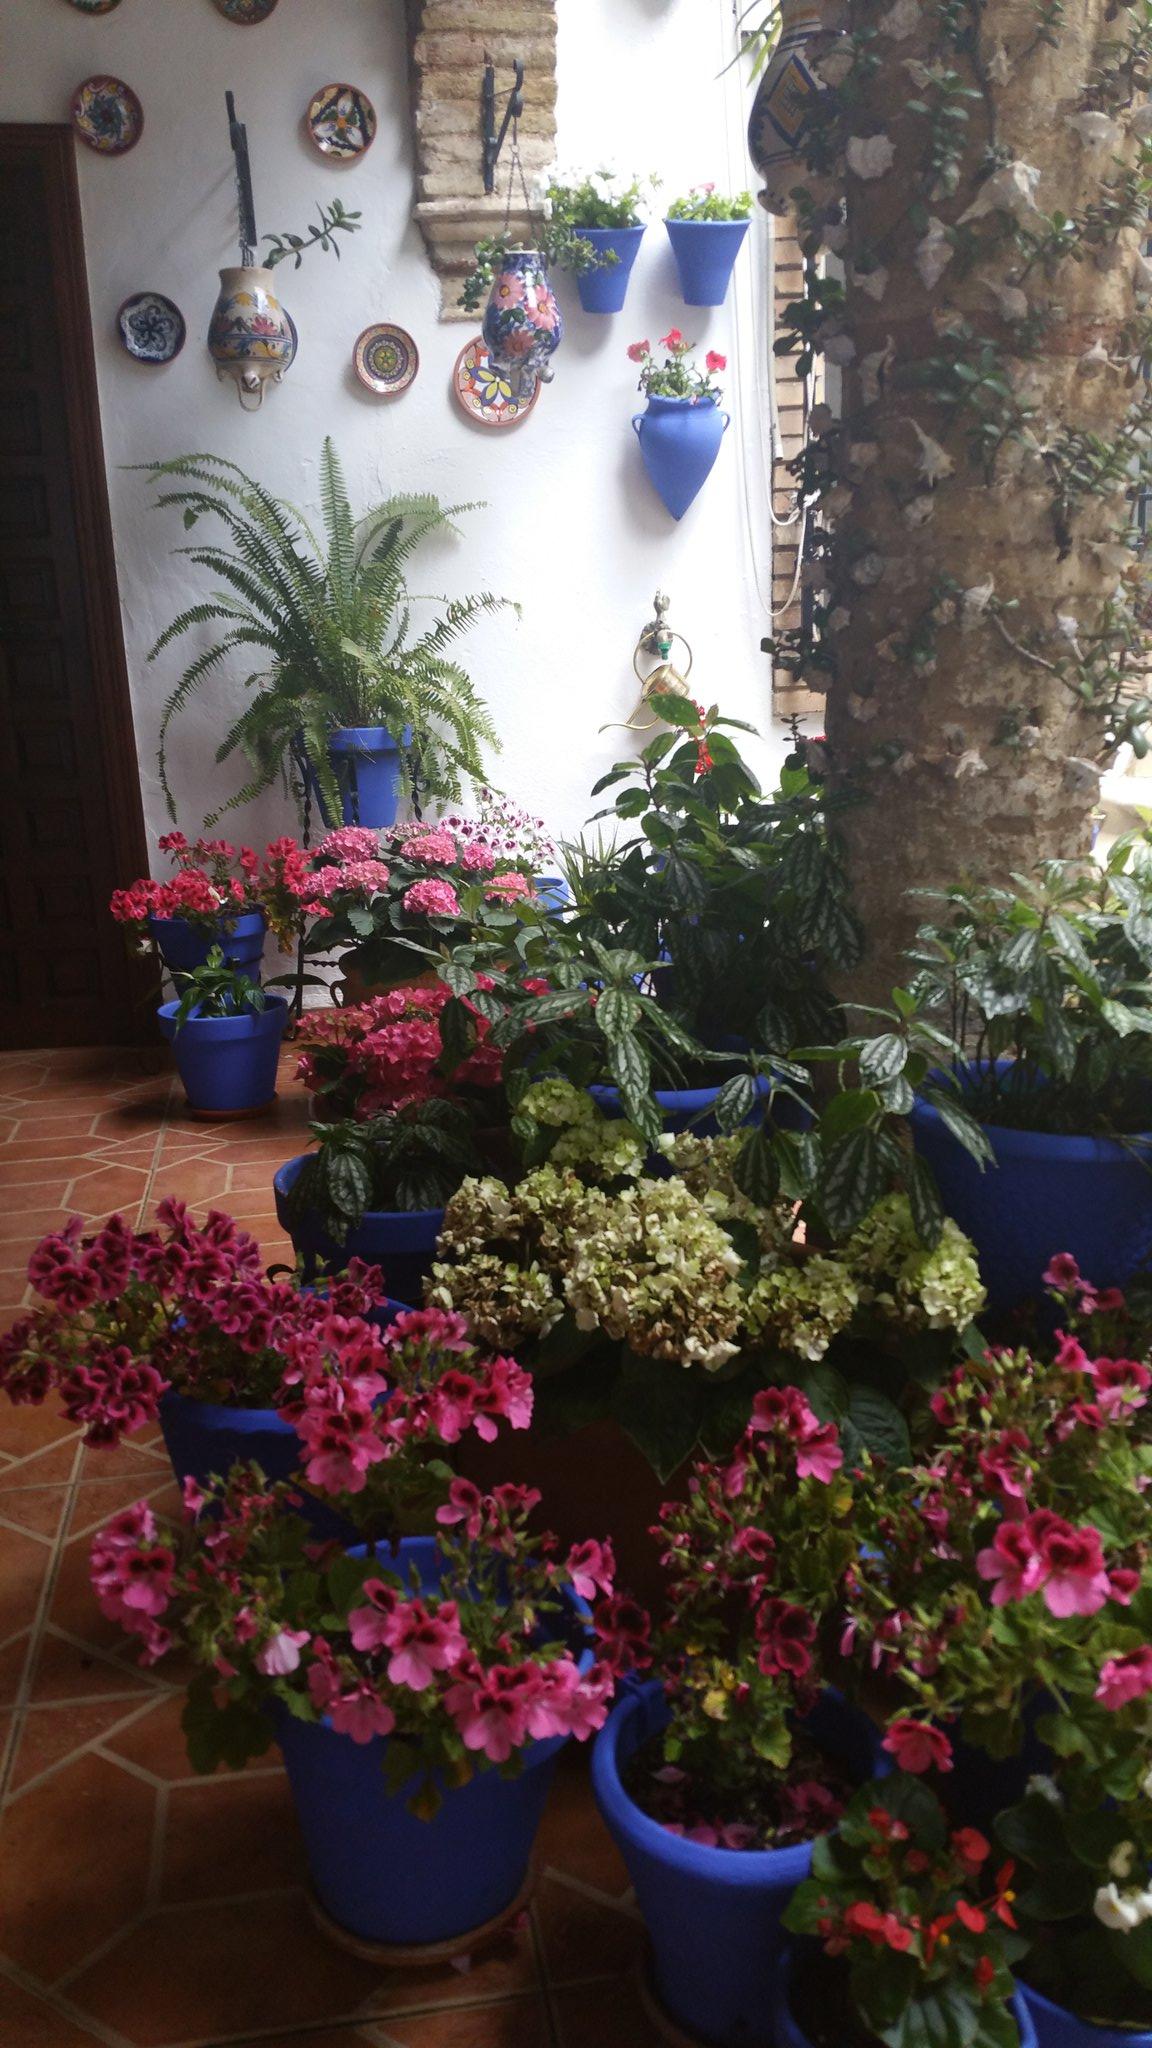 Enjoying the featival of patios in #Cordoba https://t.co/Od1BuUT3oe